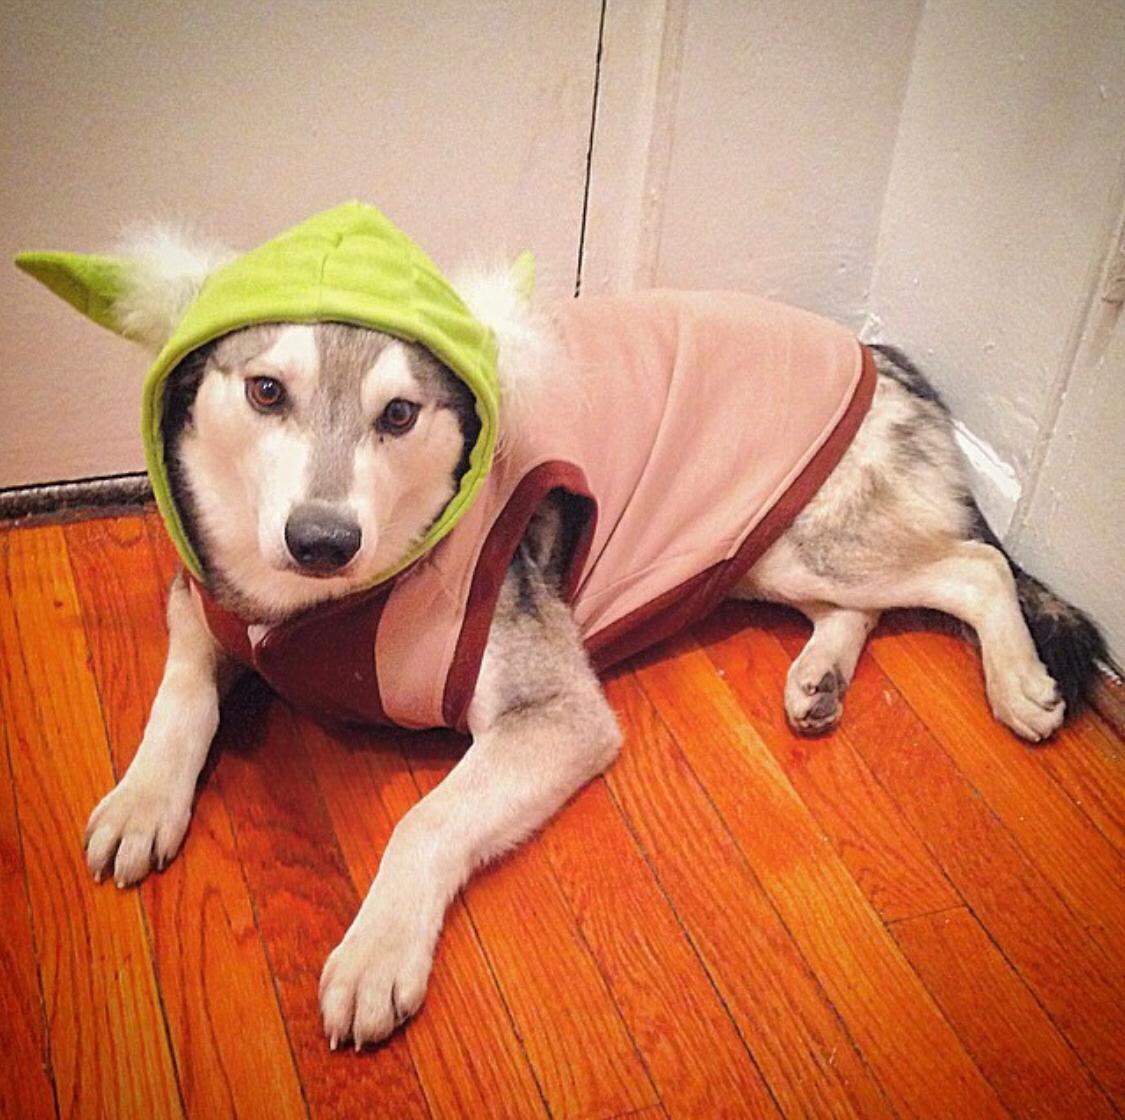 mini husky with master yoda costume